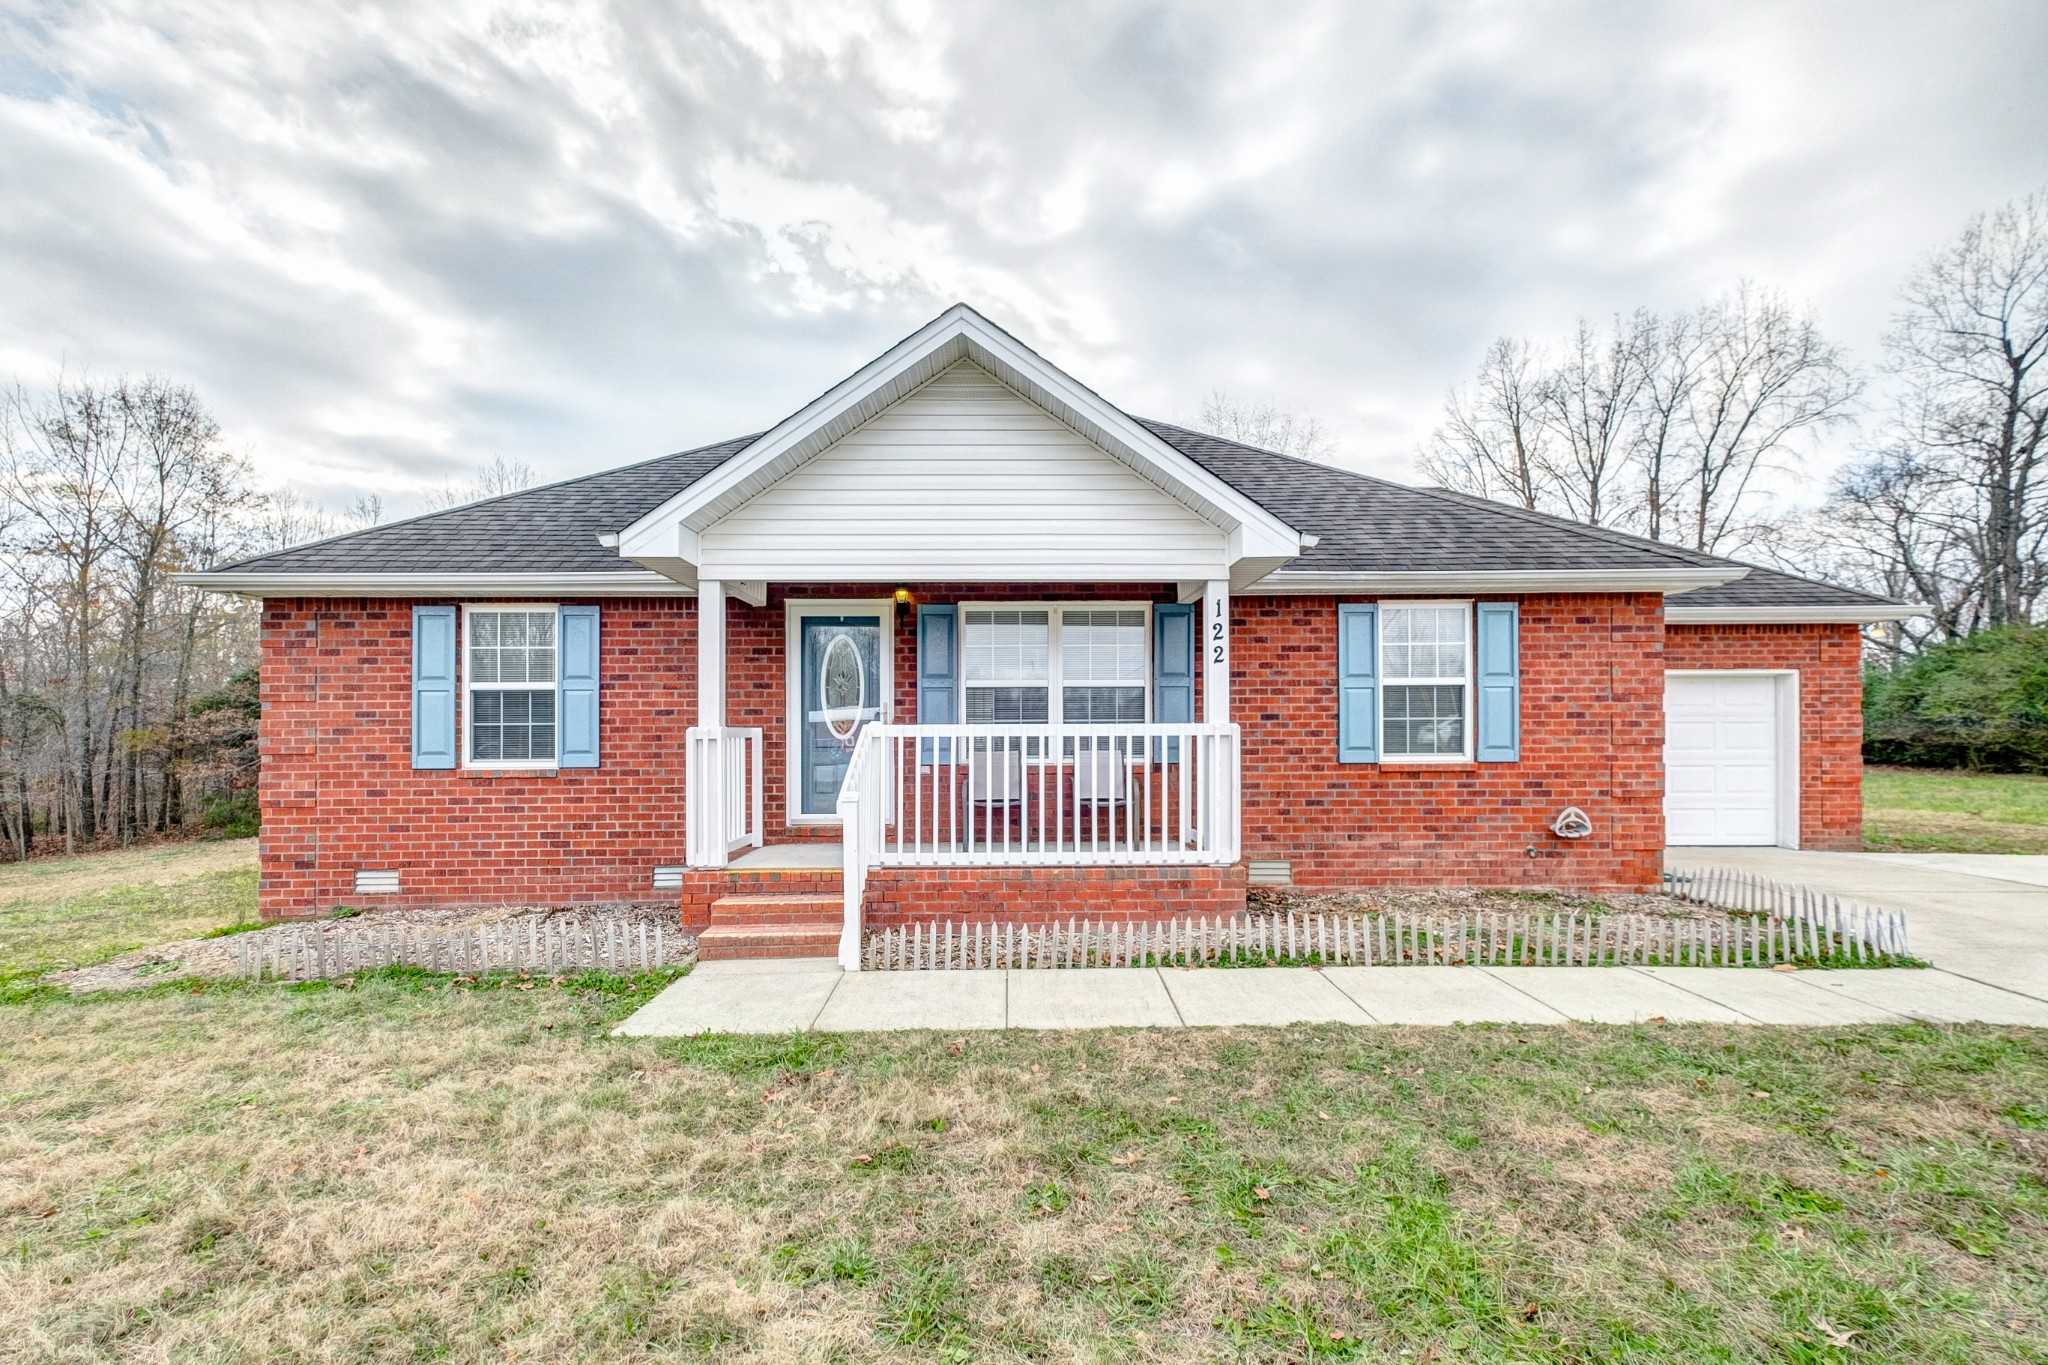 122 Melton Ln Property Photo - Woodbury, TN real estate listing